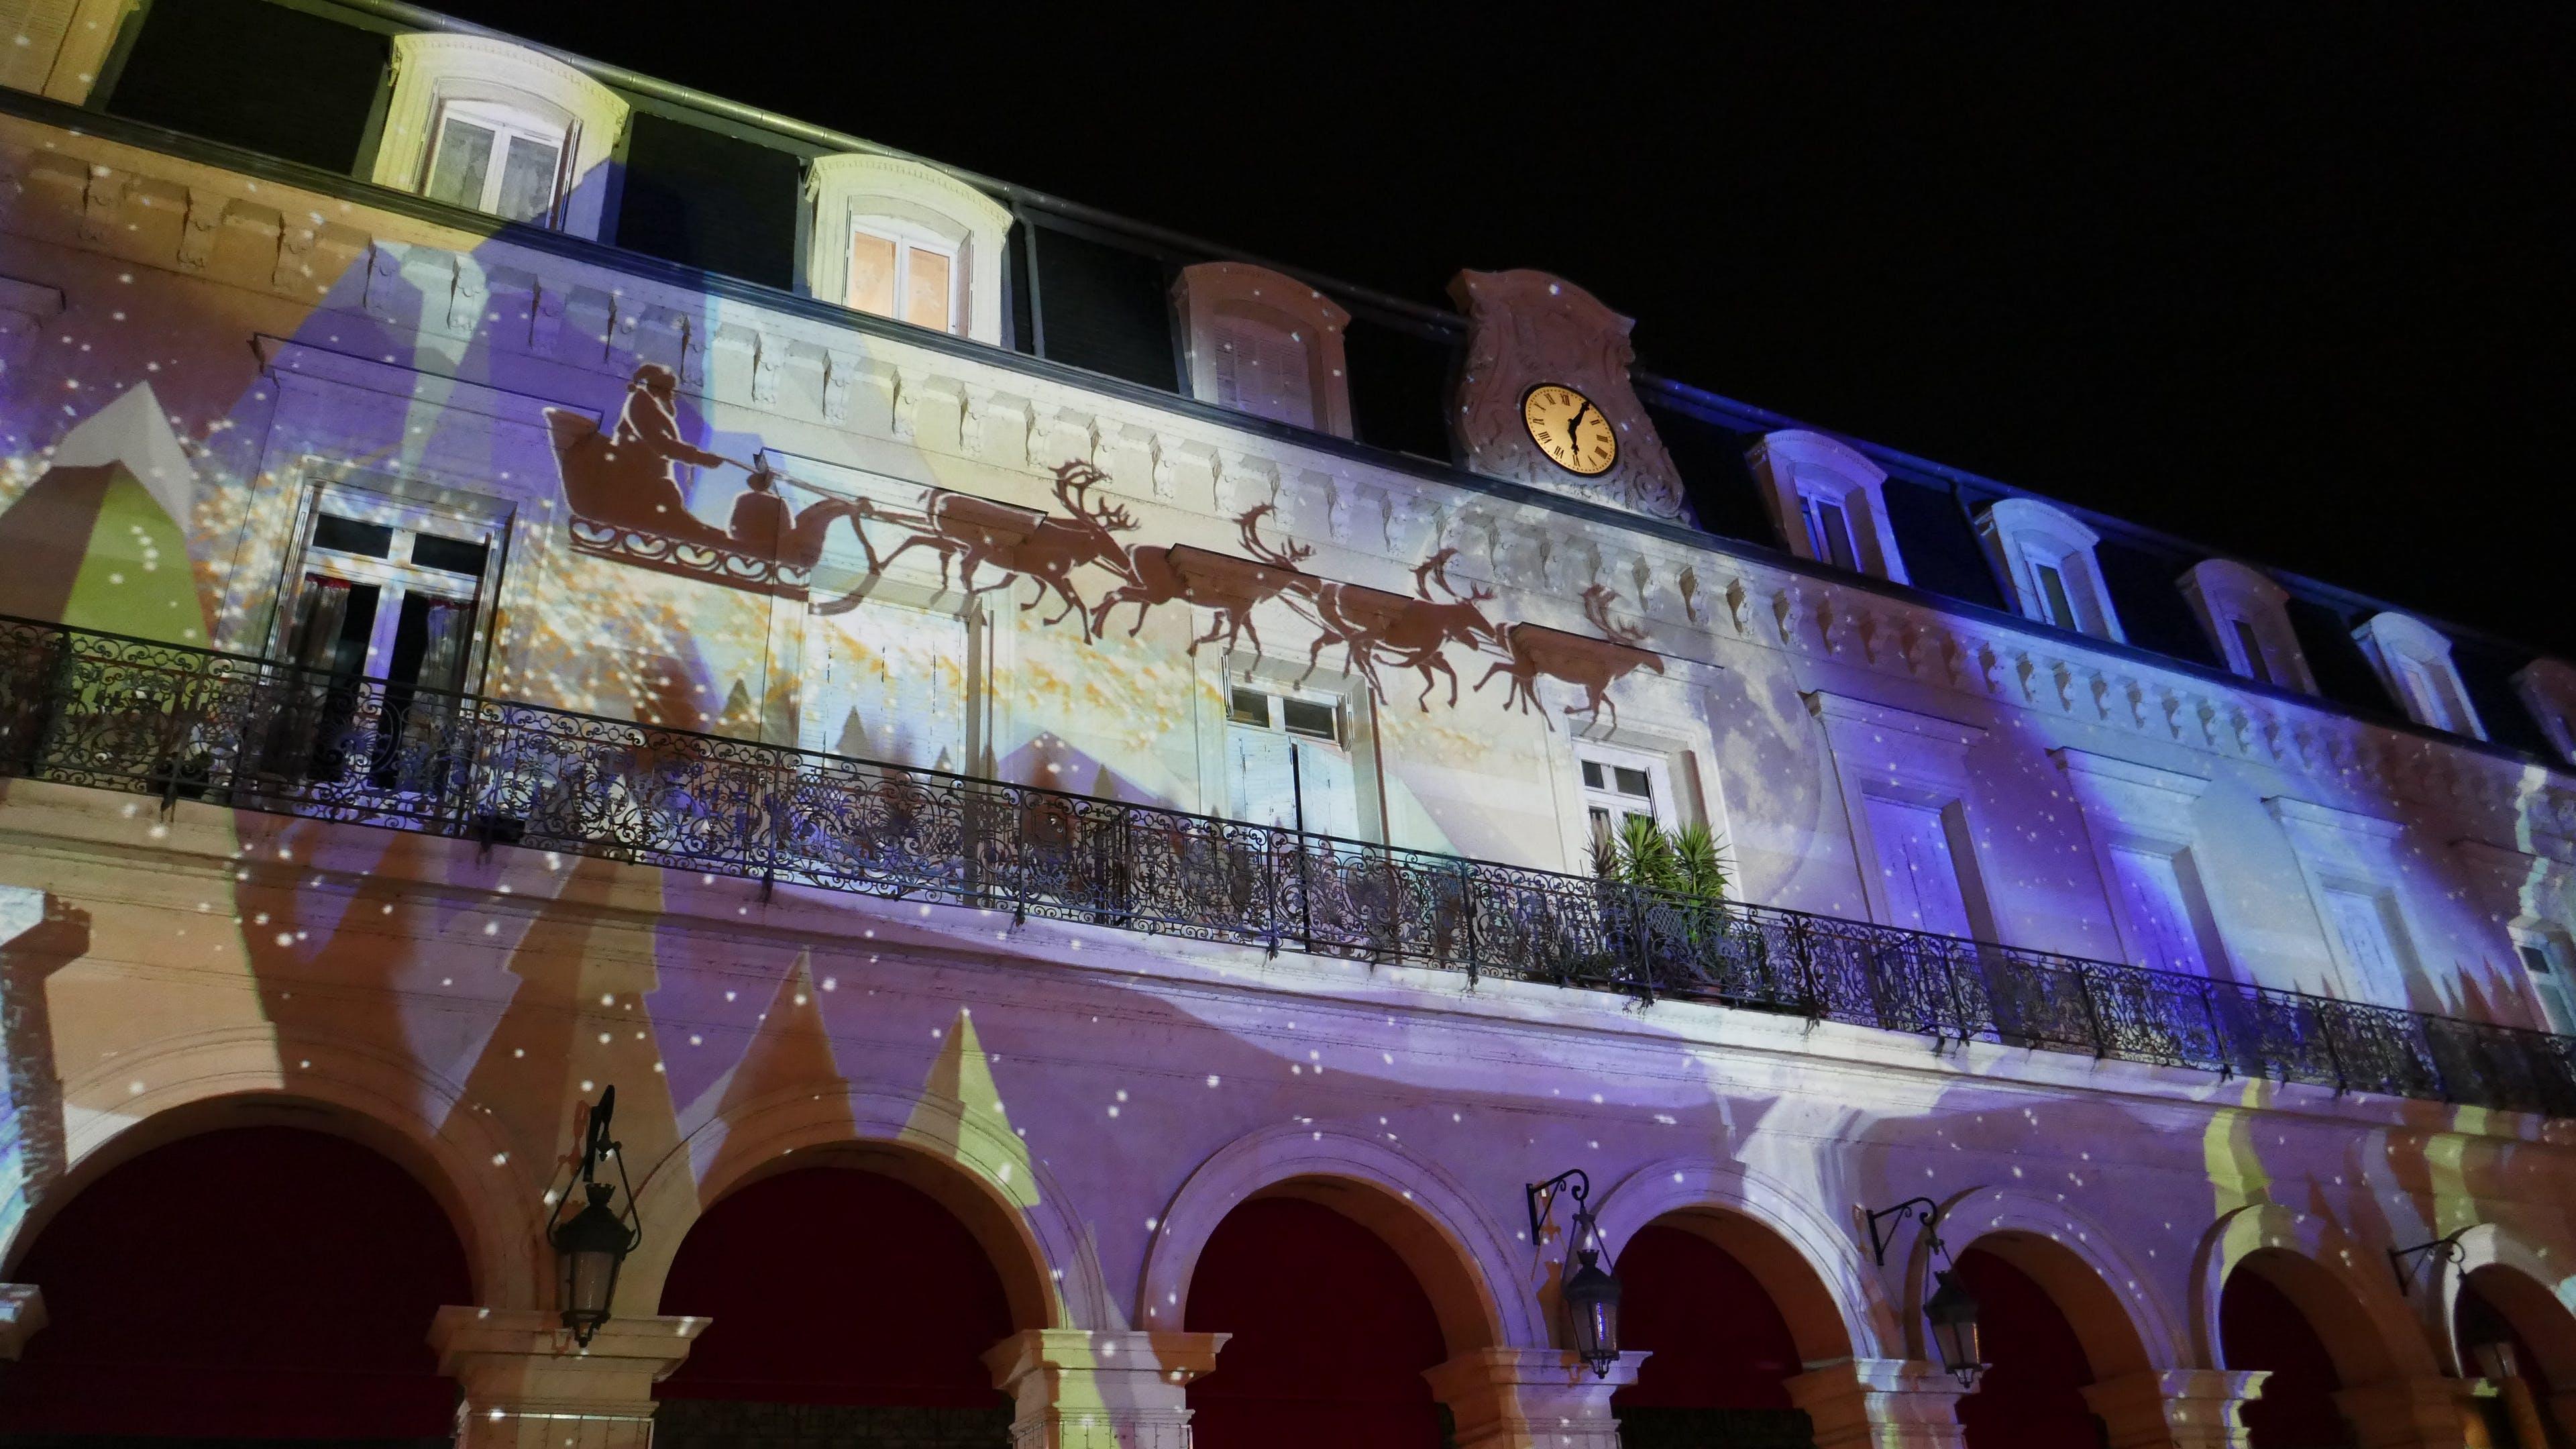 Free stock photo of christmas lighs, Ephemeral city show, magical, night market